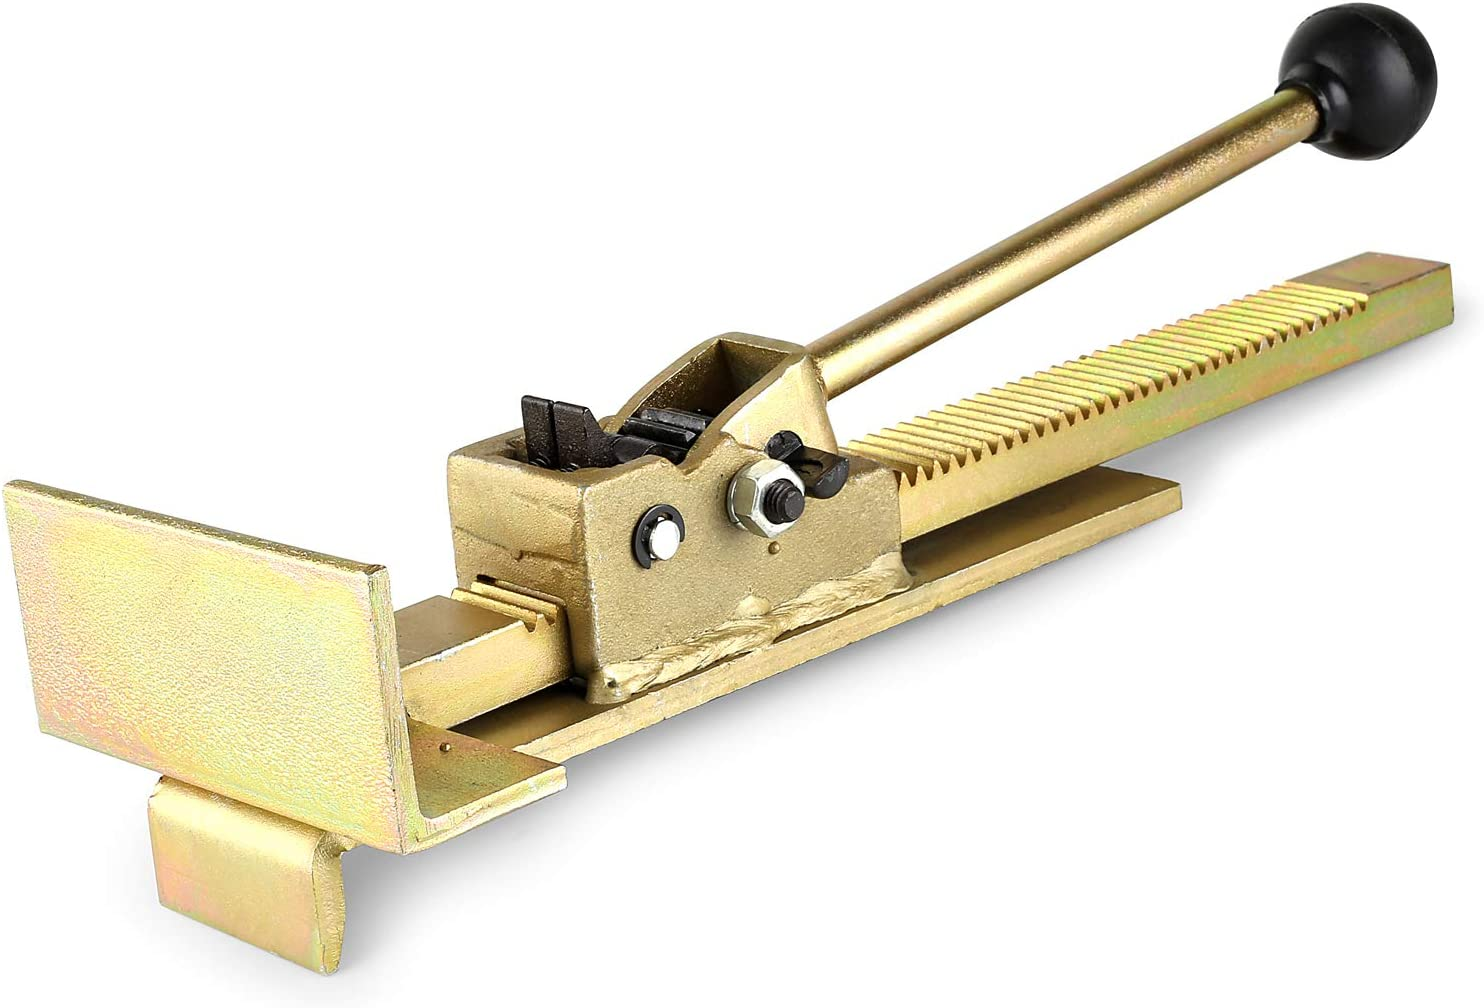 Professional Flooring Jack Install Hard Wood Straight Tile Contractor Hand Tool